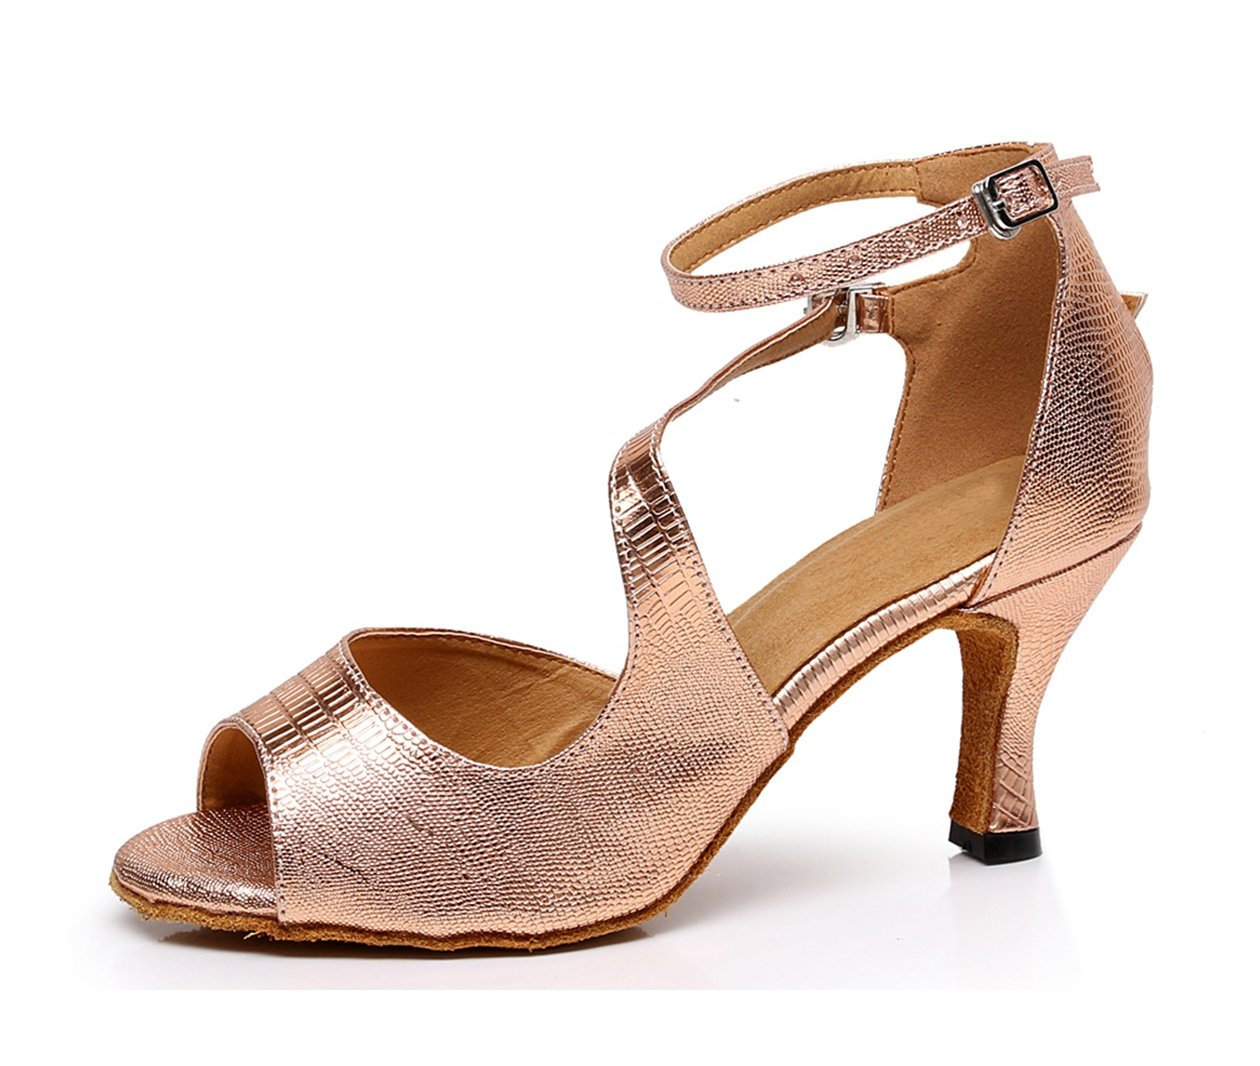 Minishion Women's Stylish Rose/Gold Synthetic Tango Latin Ballroom Dance Shoes Evening Wedding Sandals US 7